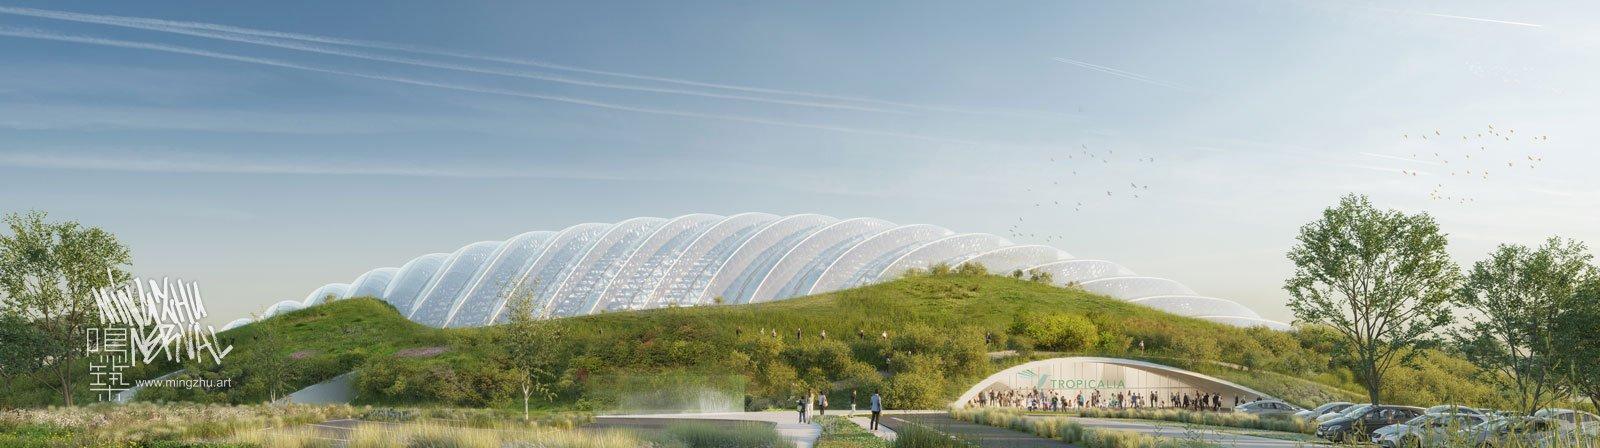 Botanical Garden by Mingzhu Nerval in France, 2023